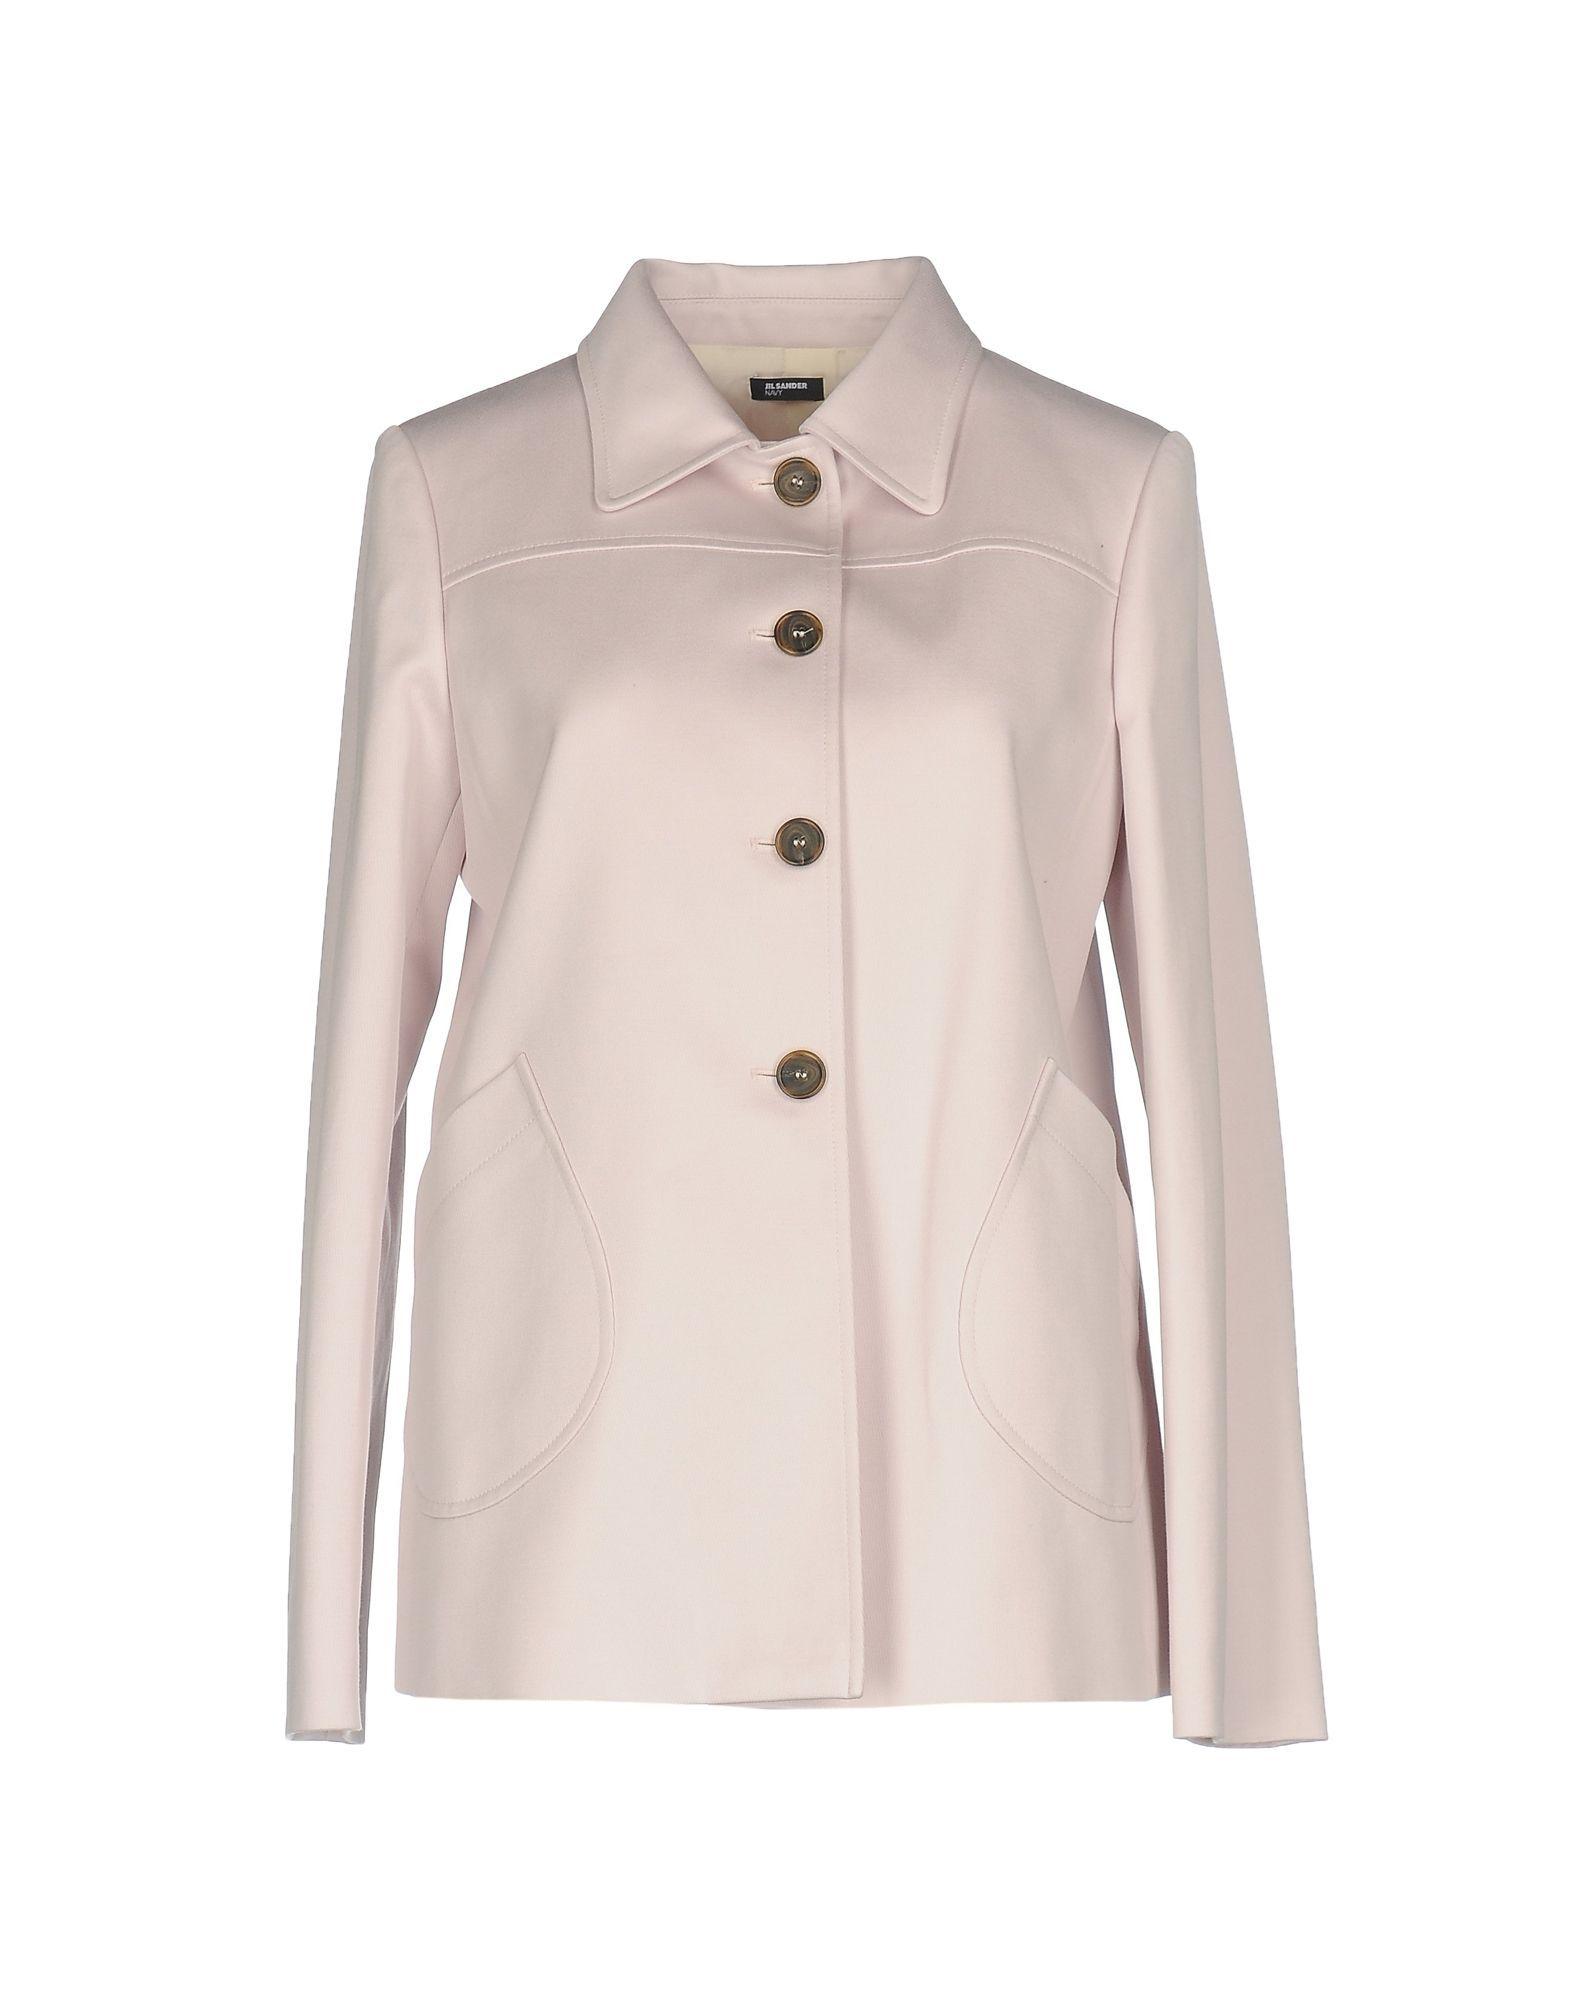 Jil Sander Navy Pink Cotton Classic Jacket